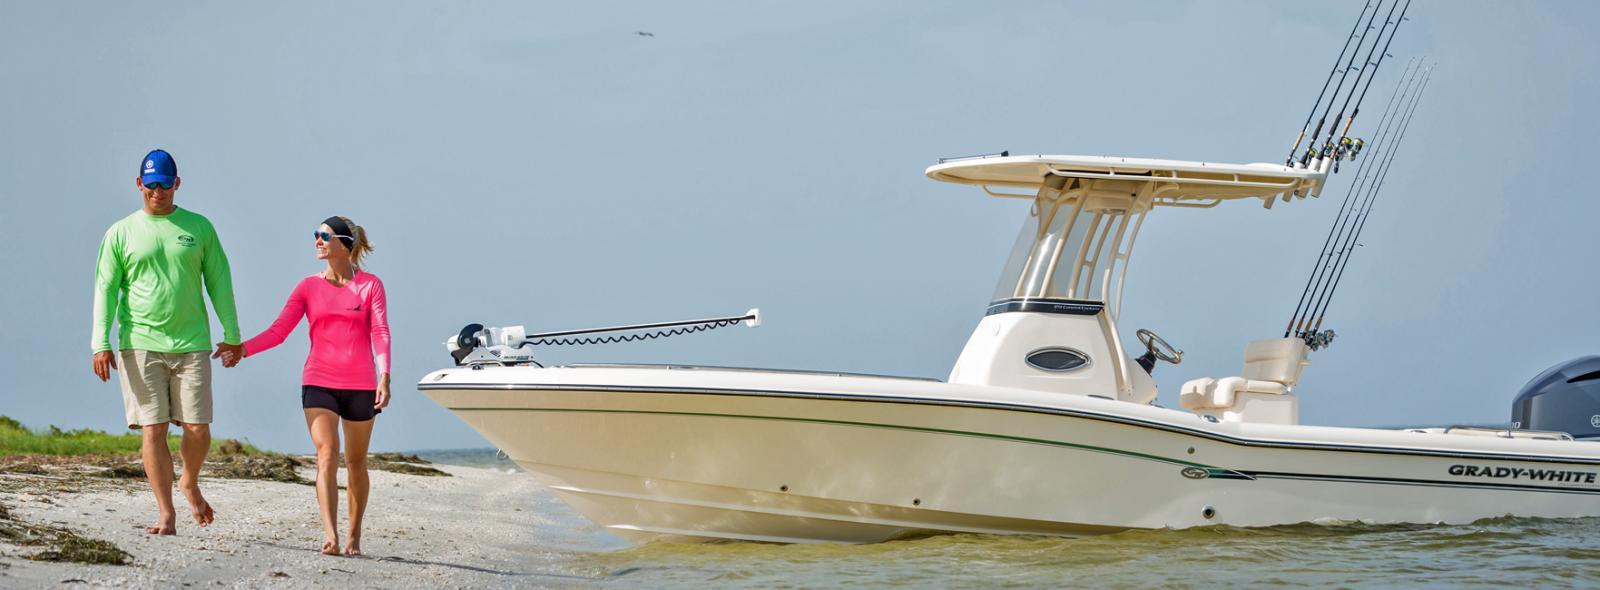 Atlantic Marine | New Grady White Boats | Boat Dealers Wilmington NC